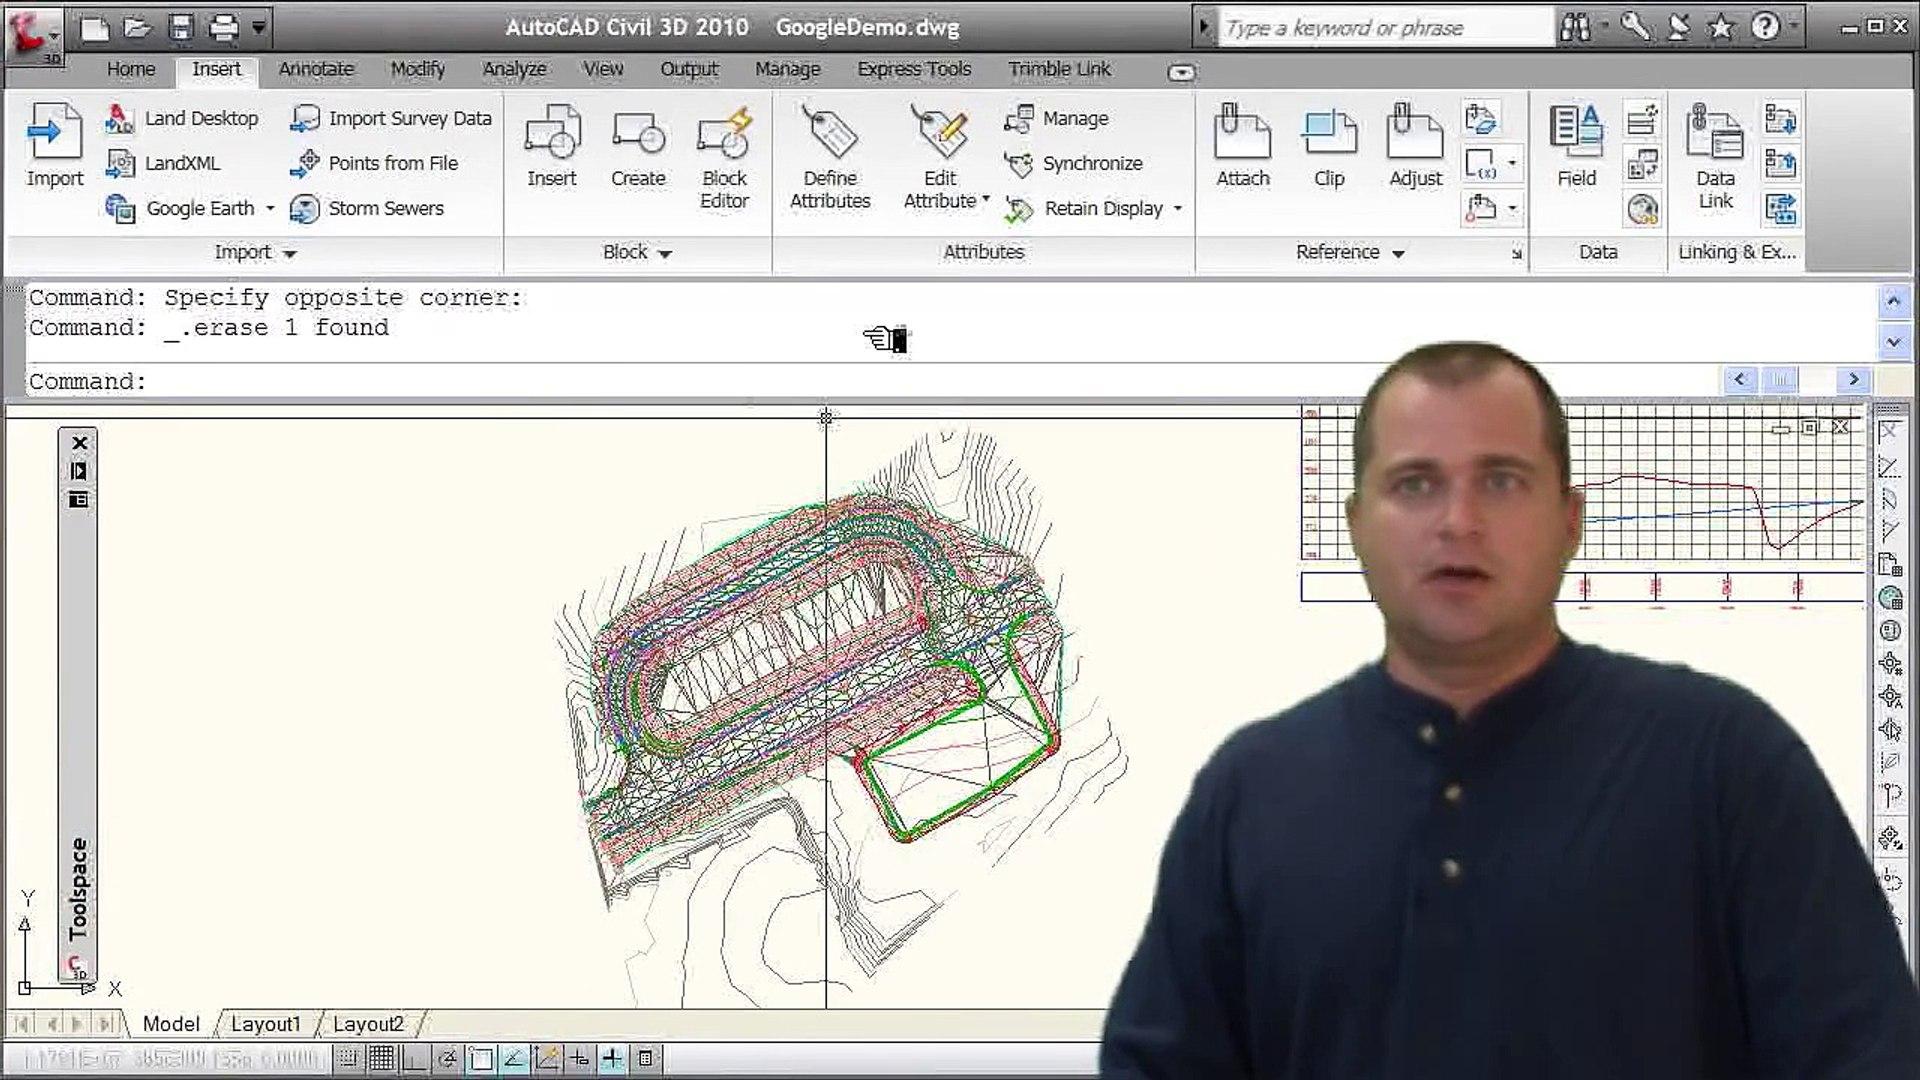 Sharing Civil 3D Model in Google Earth